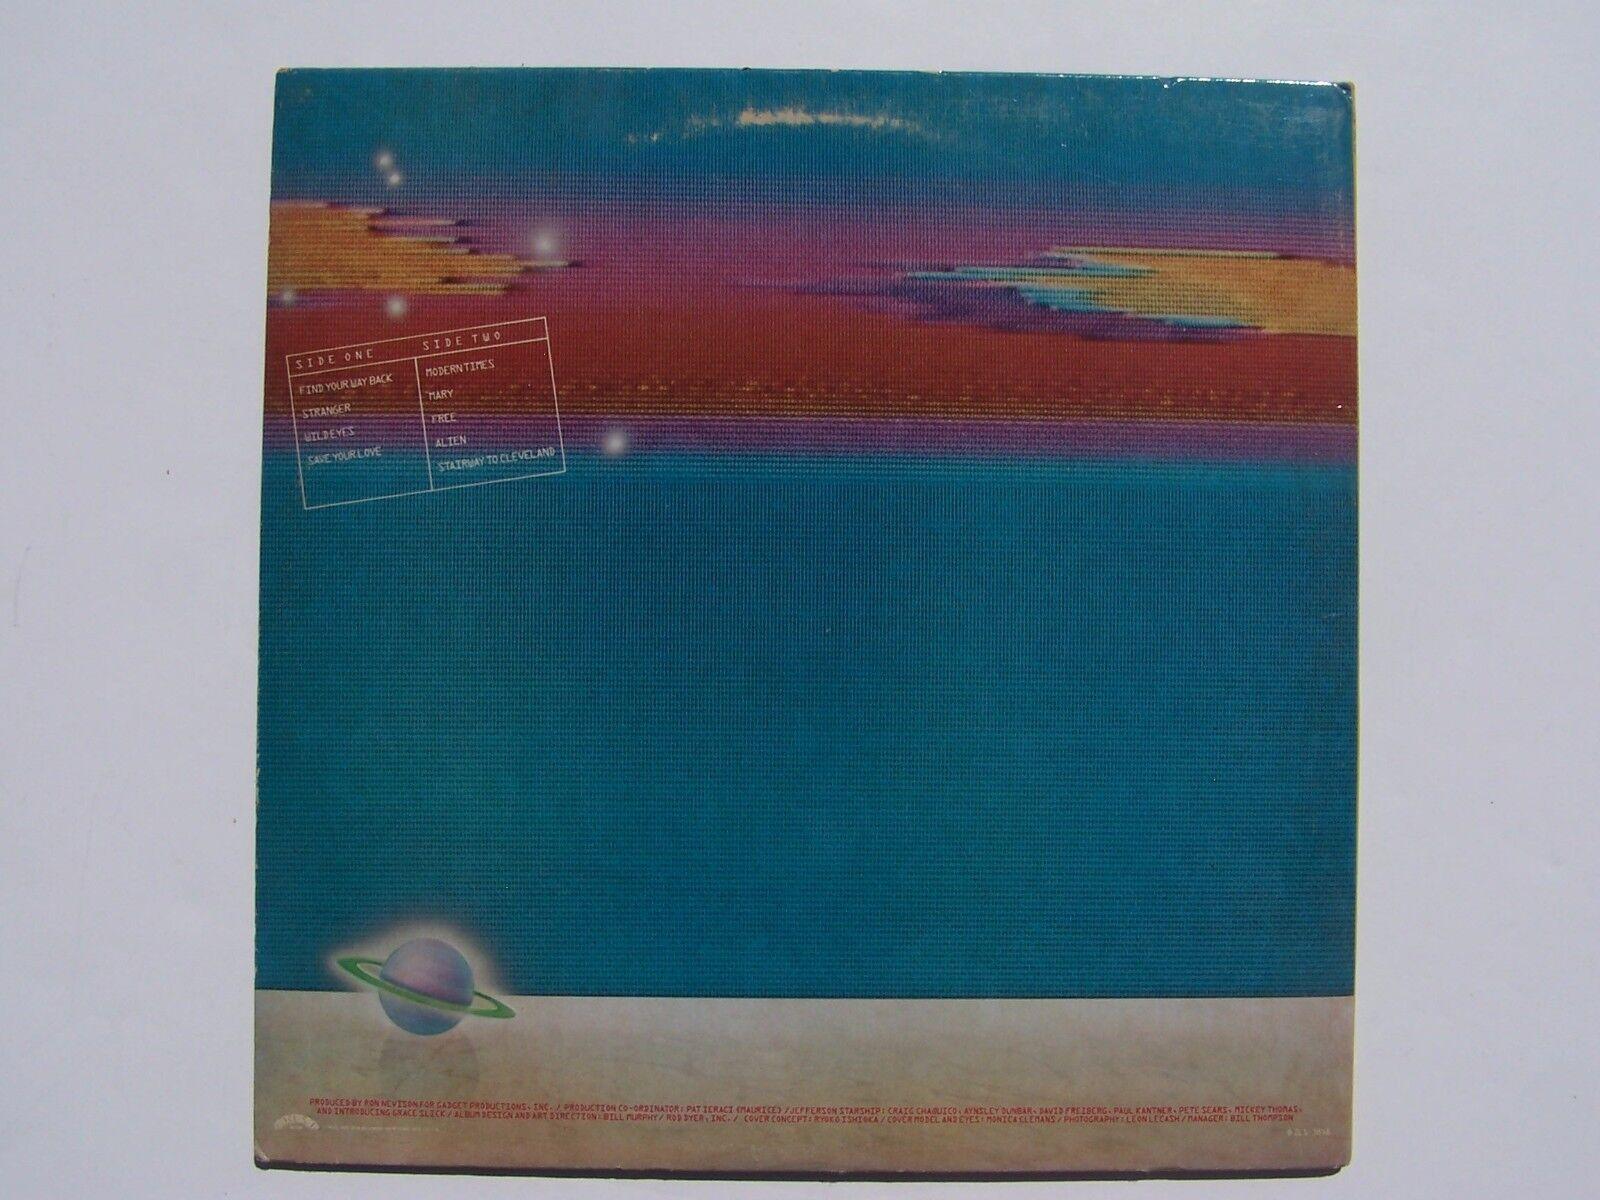 Jefferson Starship - Modern Times Vinyl LP Record Album